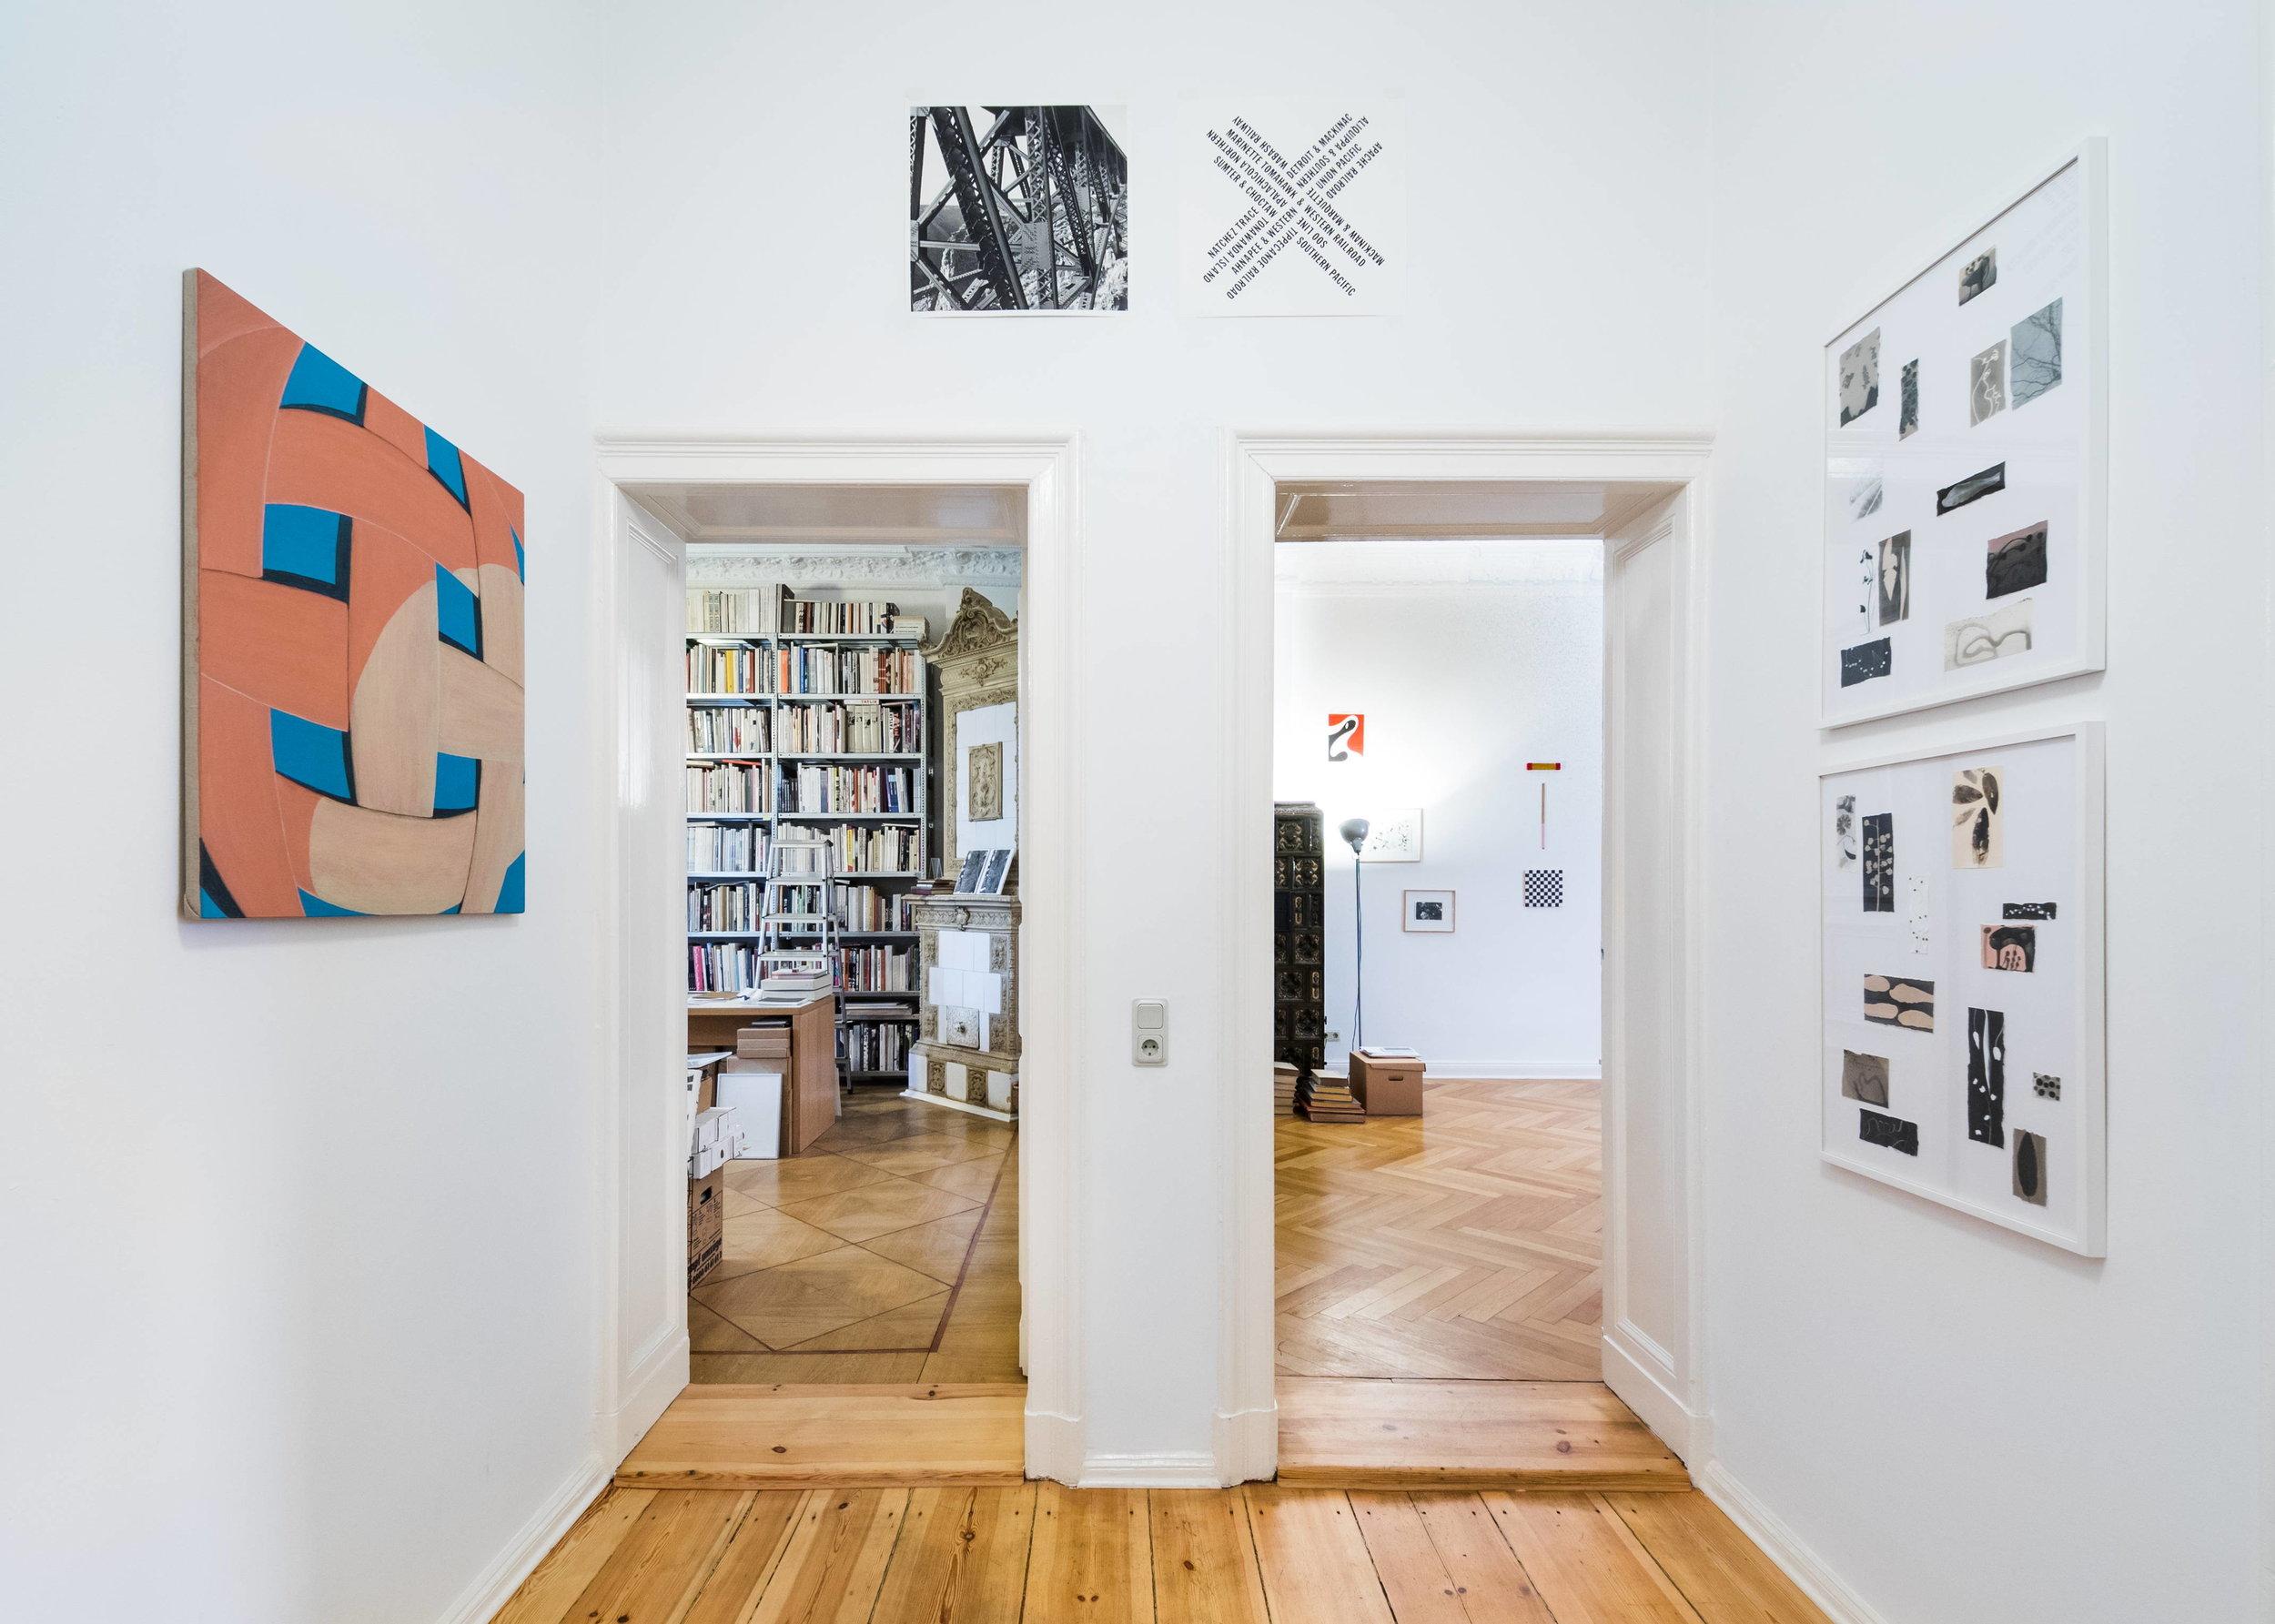 Lothar Baumgarten, Max Renkel, Michaela-Maria Langenstein - Antiquariat Marco Gietmann, Berlin